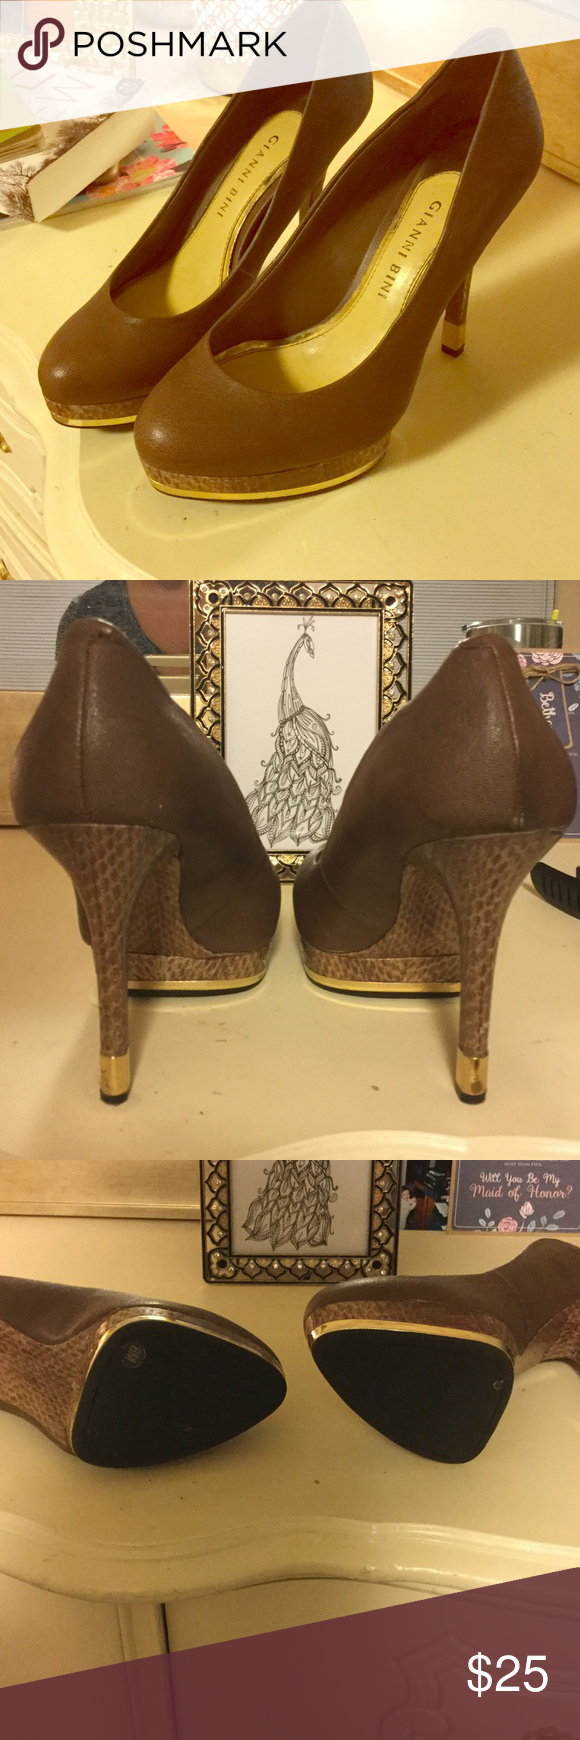 Size 6 Gianni Bini heels Size 6 brown Gianni Bini 4 inch heel. Gianni Bini Shoes Heels